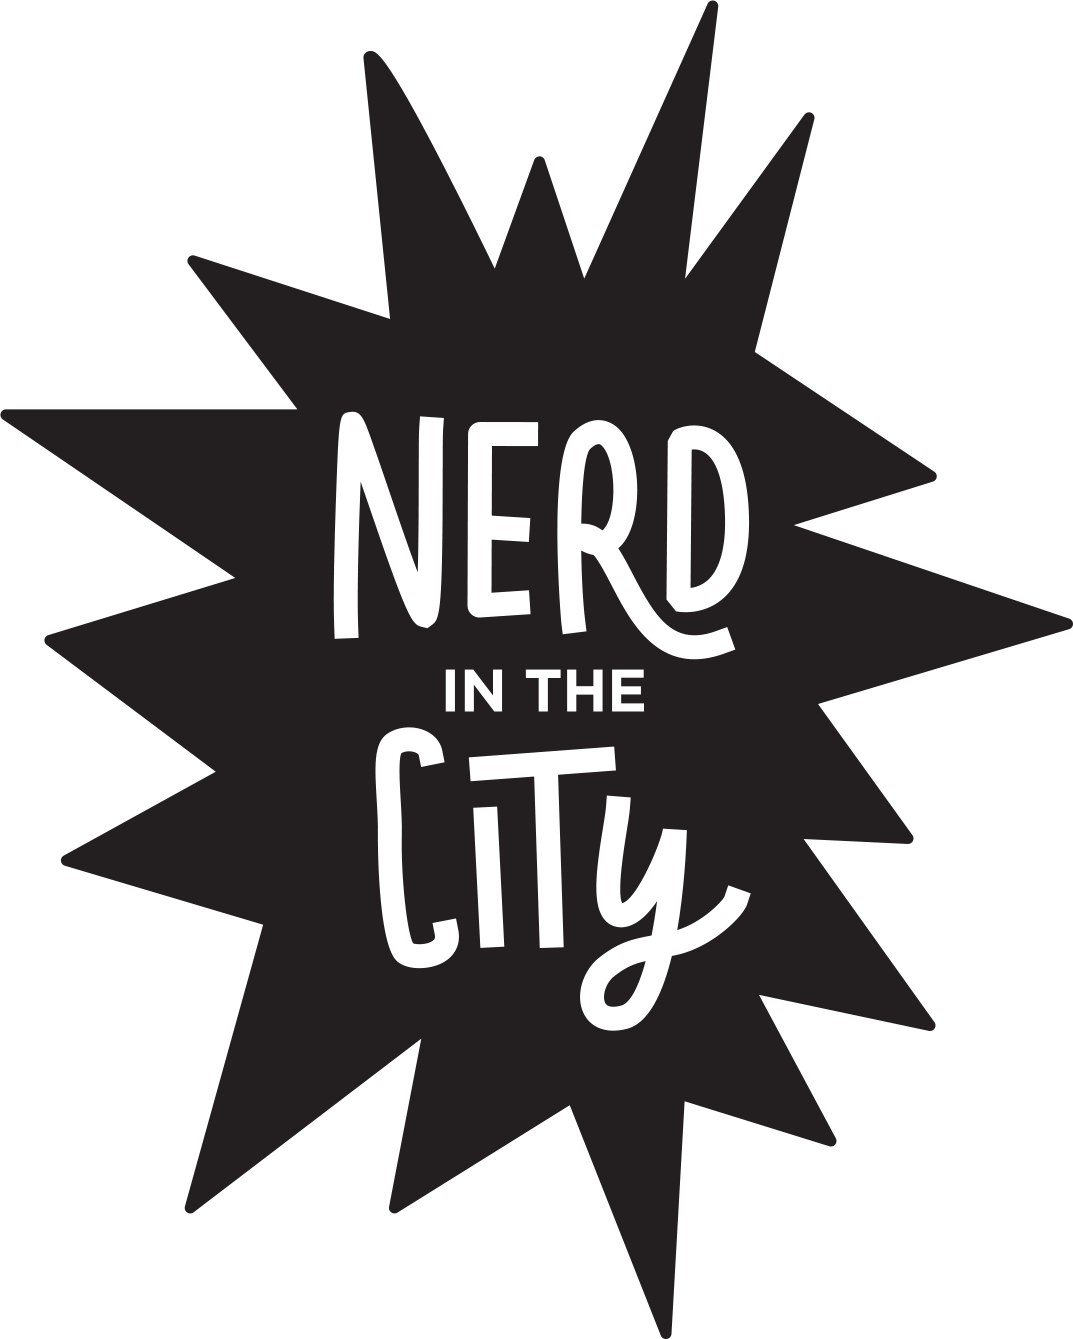 NITC_pow_logo_cutout